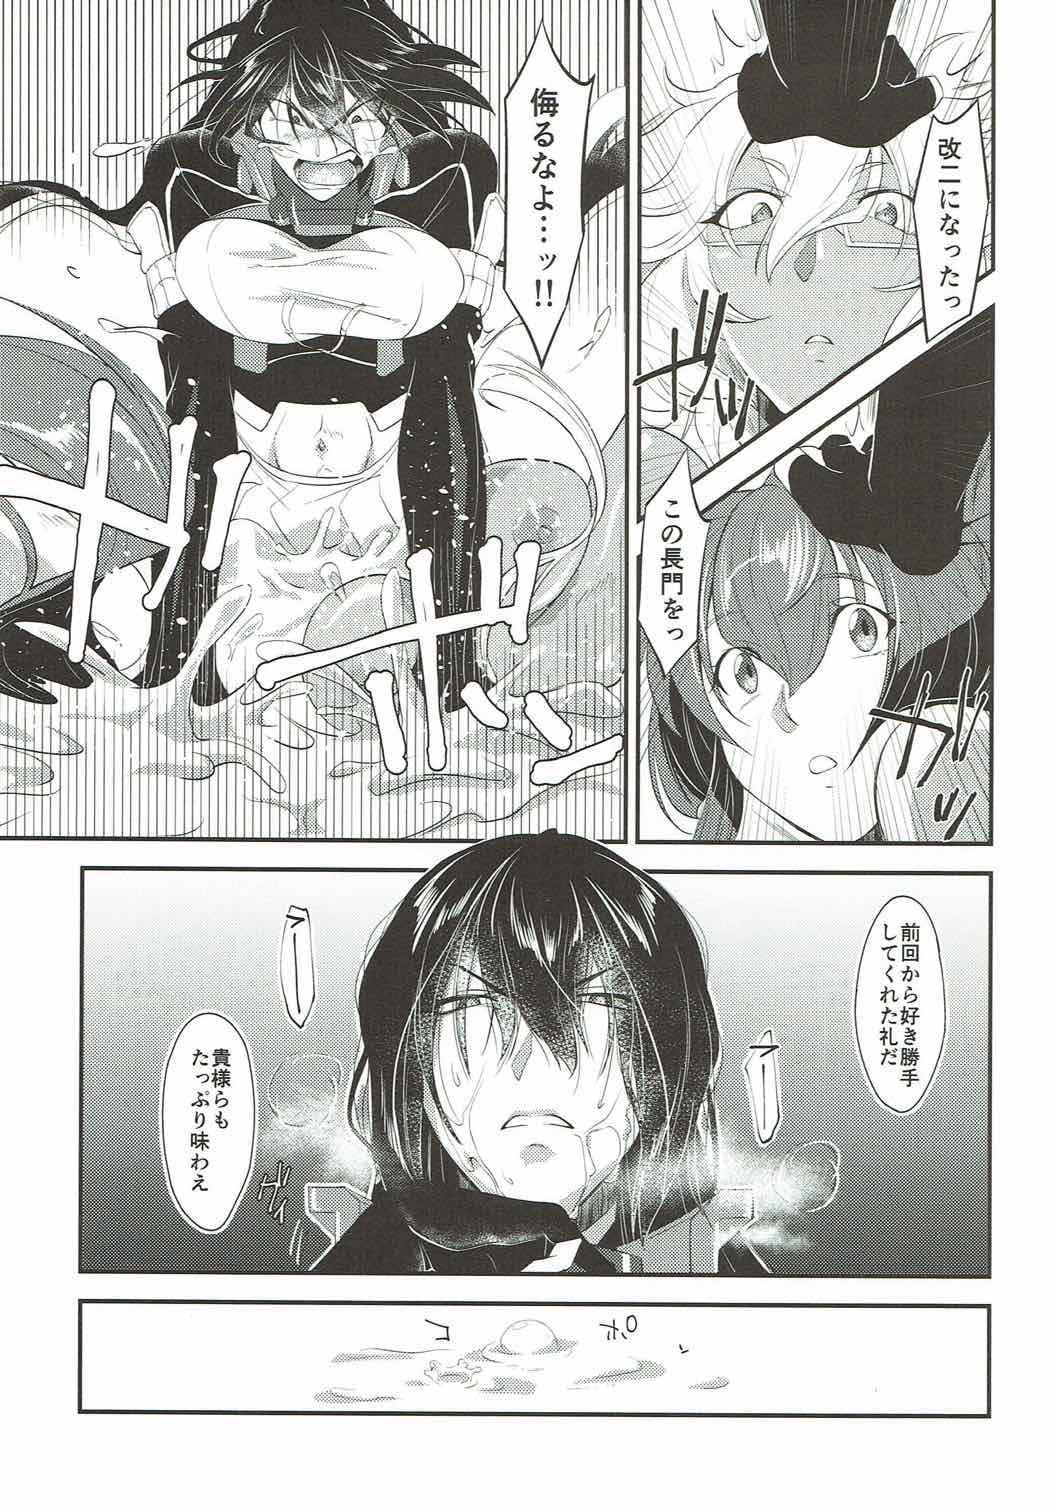 Hontou wa Kowai Yamato-gata Kai 16